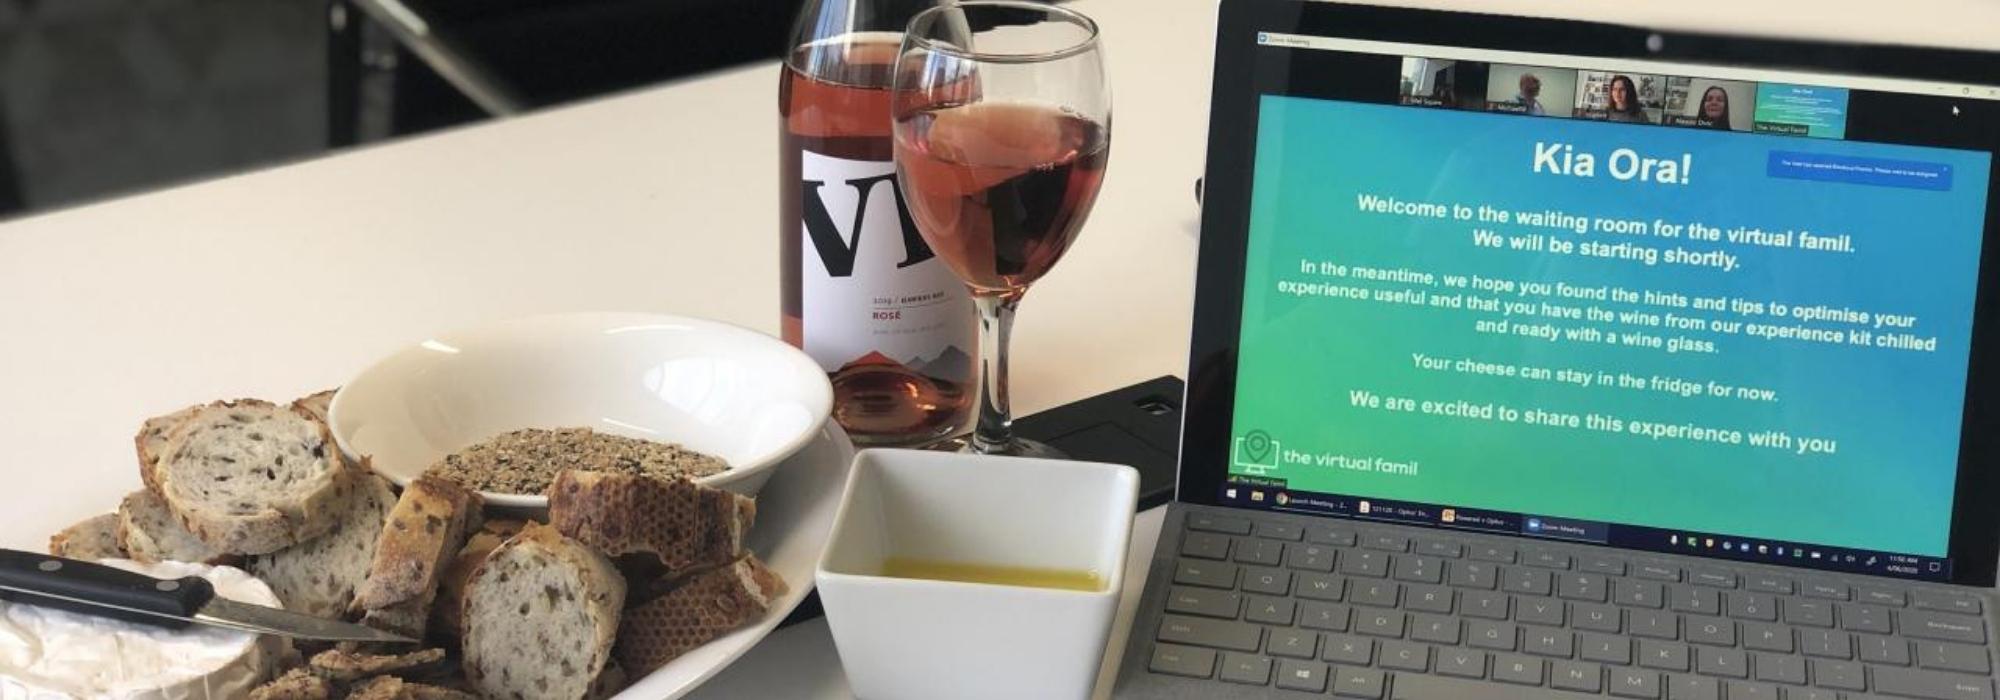 Virtual experience brings Rotorua destination to life